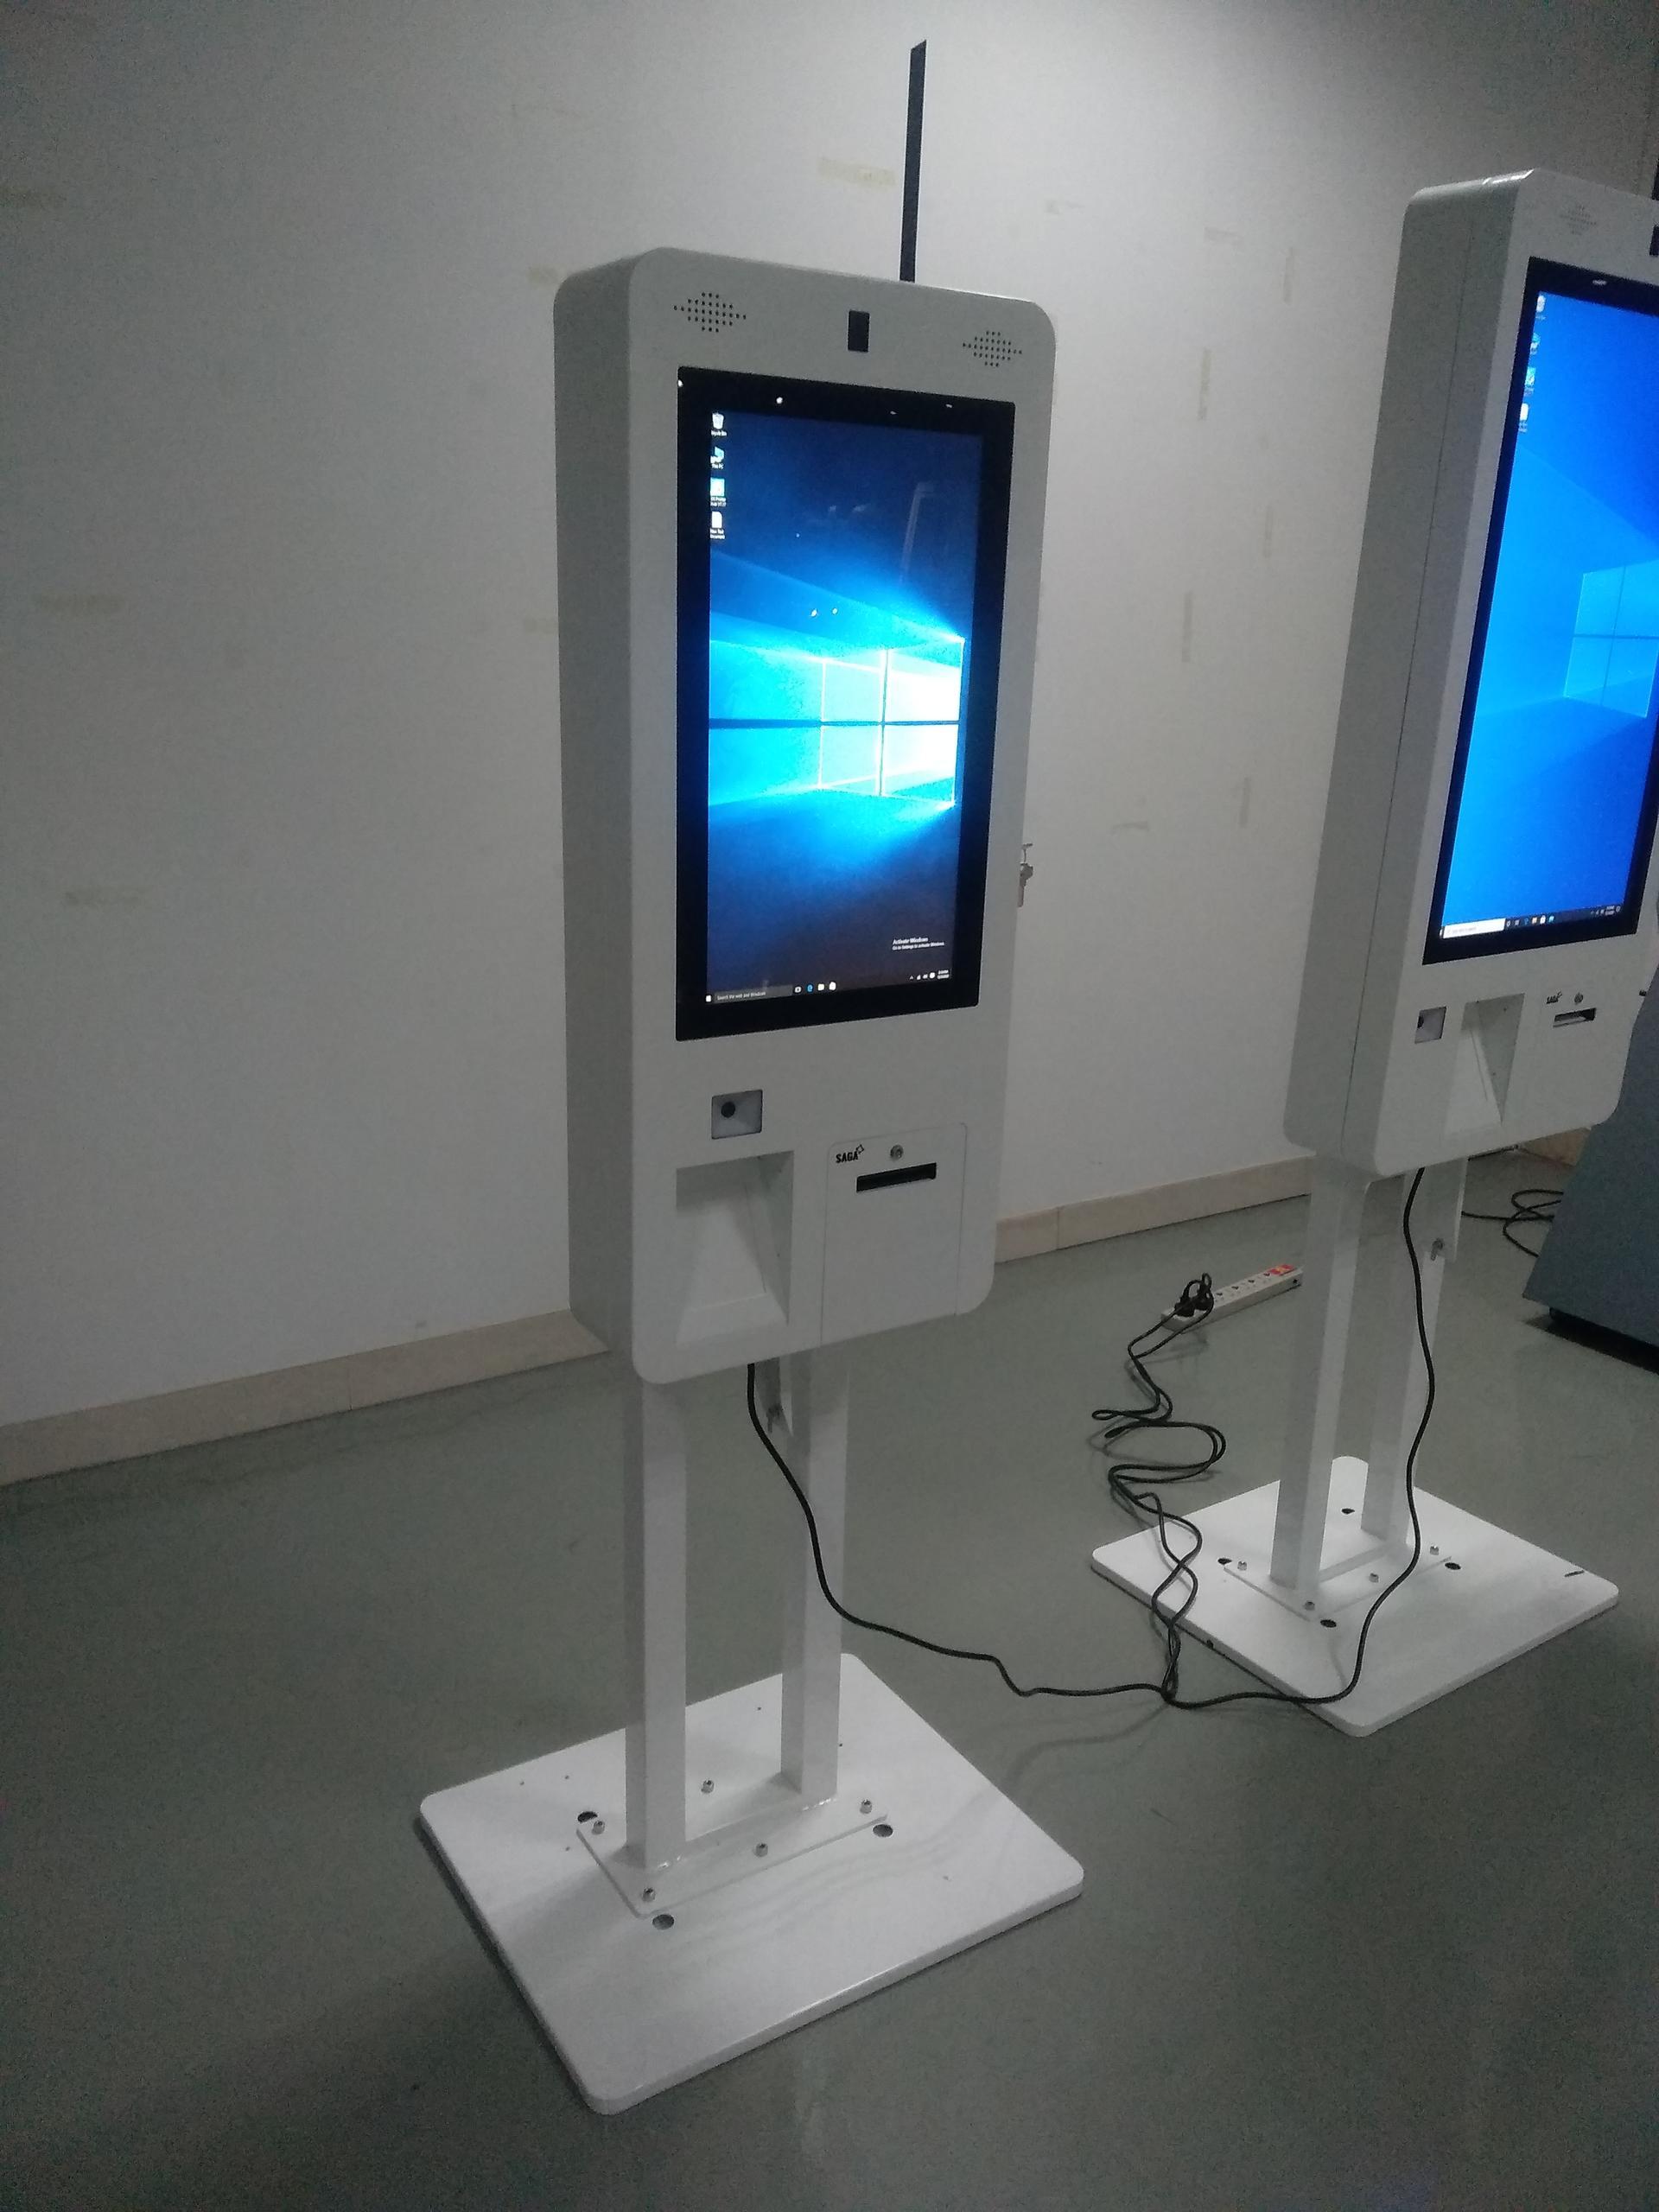 all-in-one standing custom-made touchscreen size digital signage restaurant kiosk